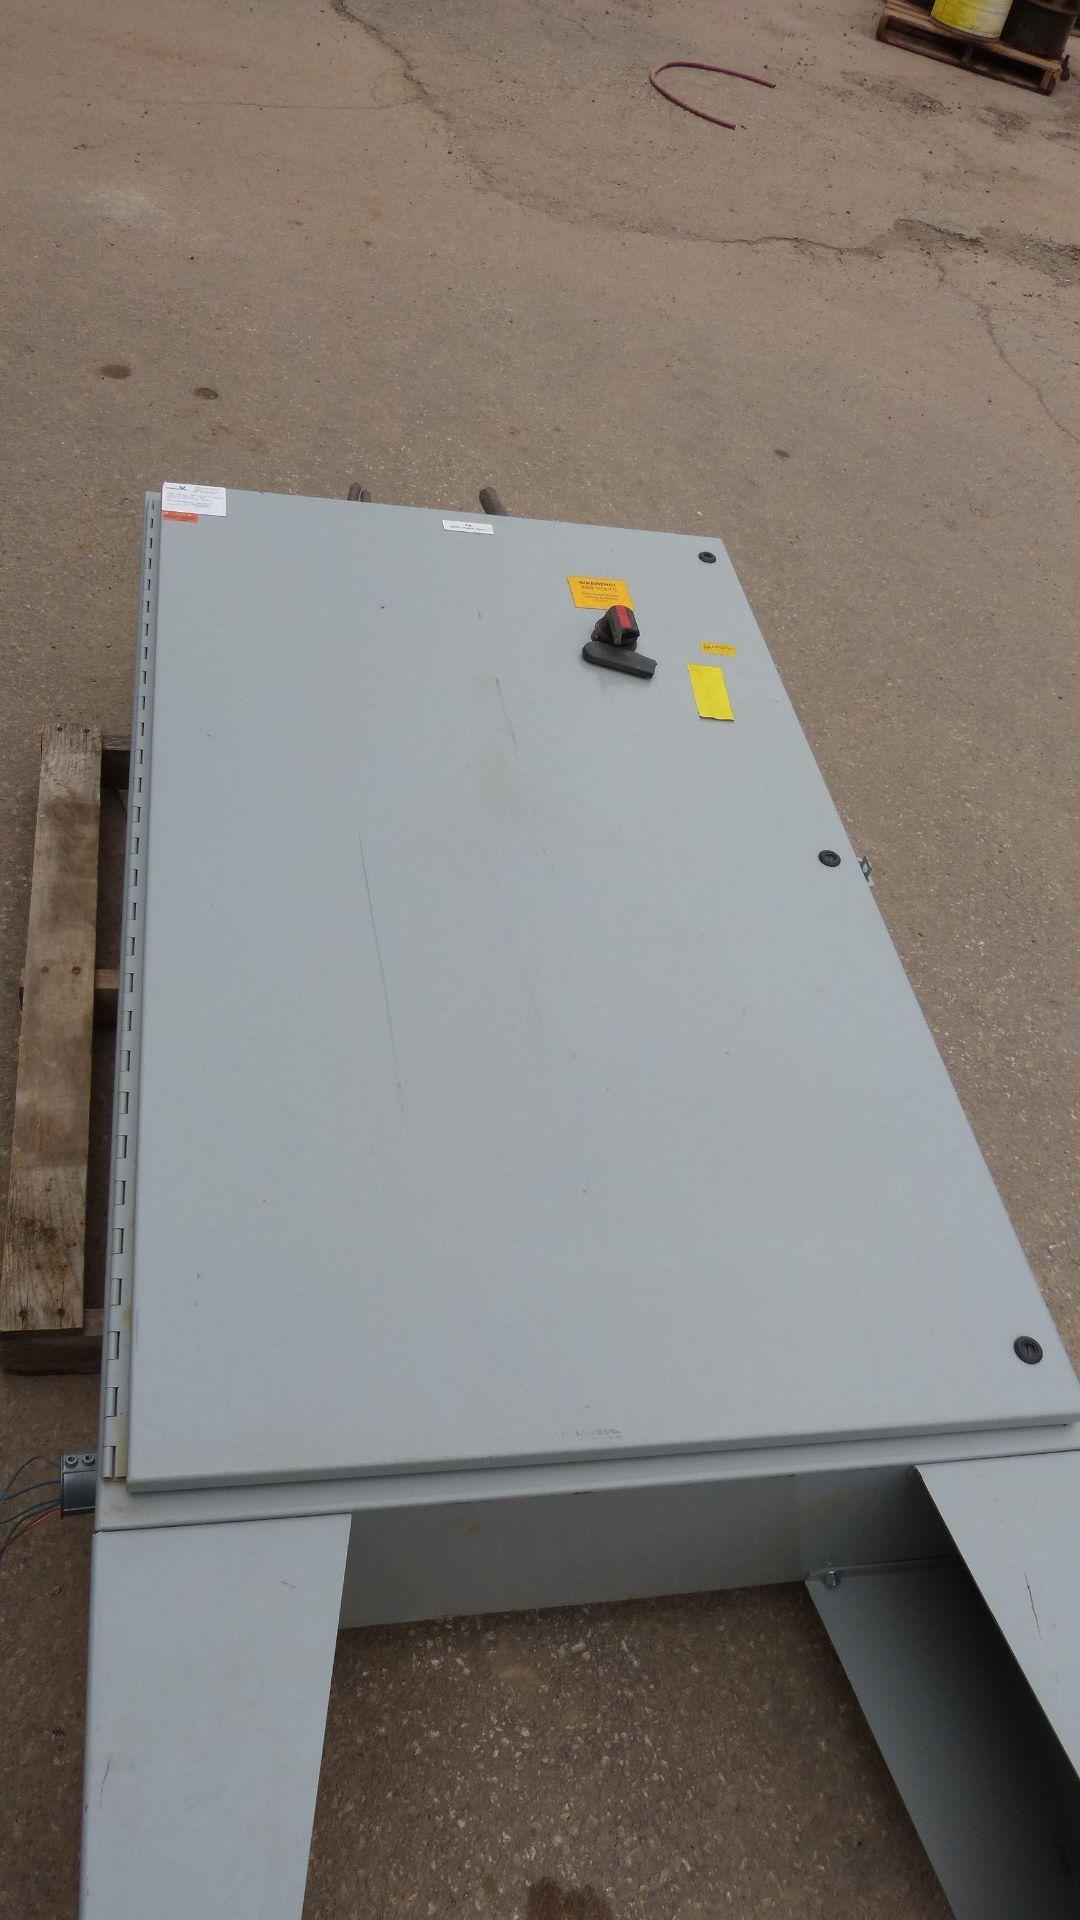 HAZEMAG IMPACT CRUSHER, MODEL 1315, 60'' DIAMETER ROTOR, 60'' WIDE, 575V, 450 HP - Image 24 of 25